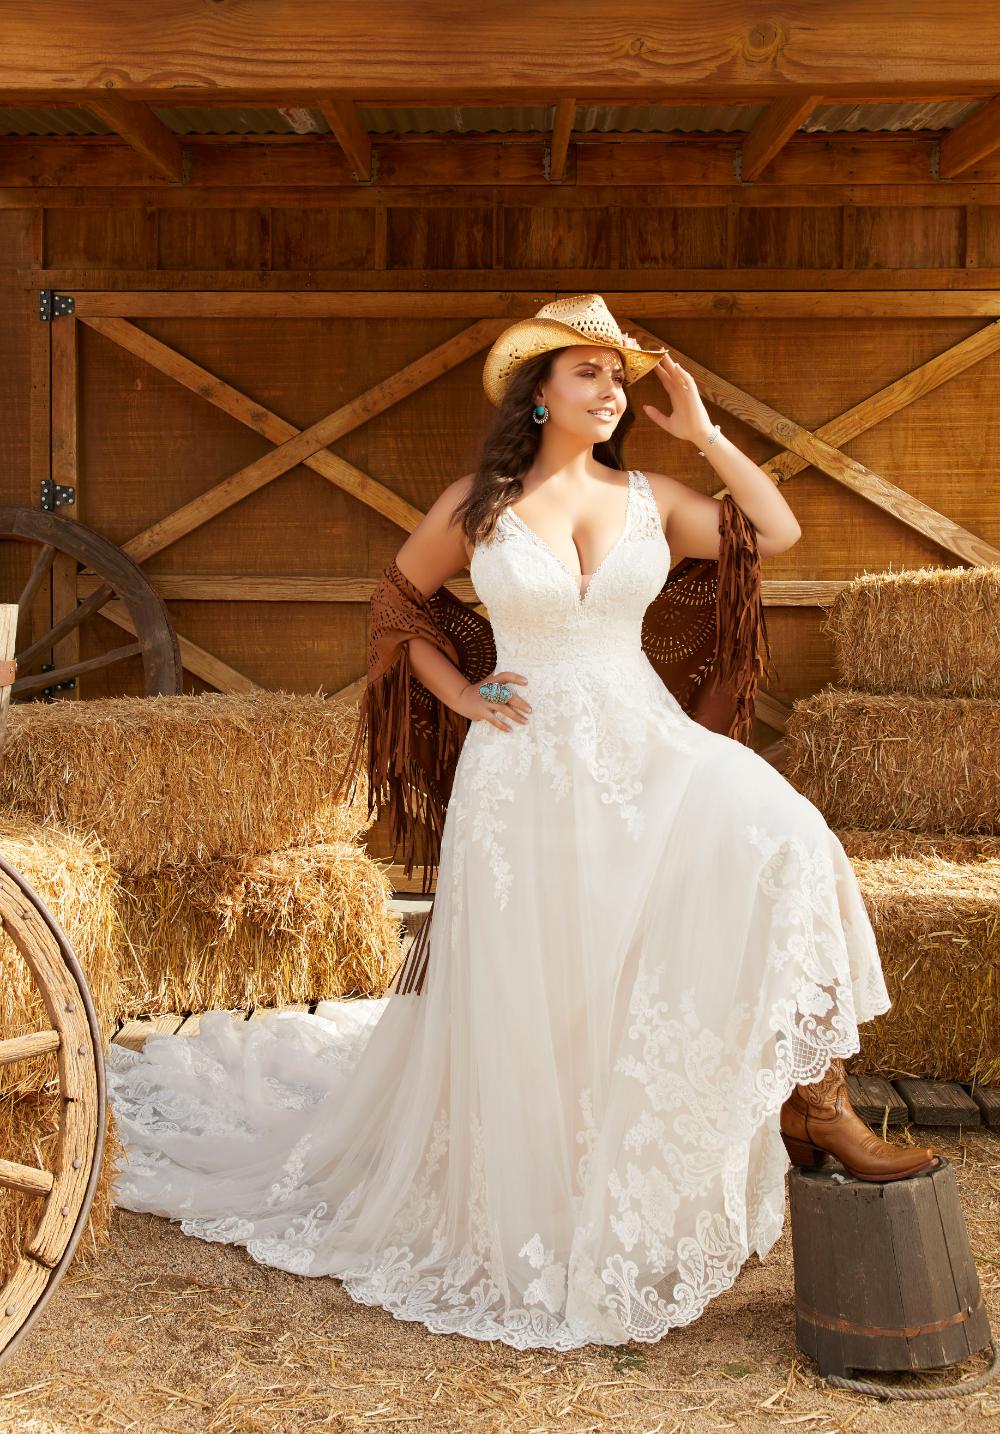 Rosario Plus Size Wedding Dress Morilee Wedding Dresses Lace Plus Size Wedding Gowns Plus Wedding Dresses